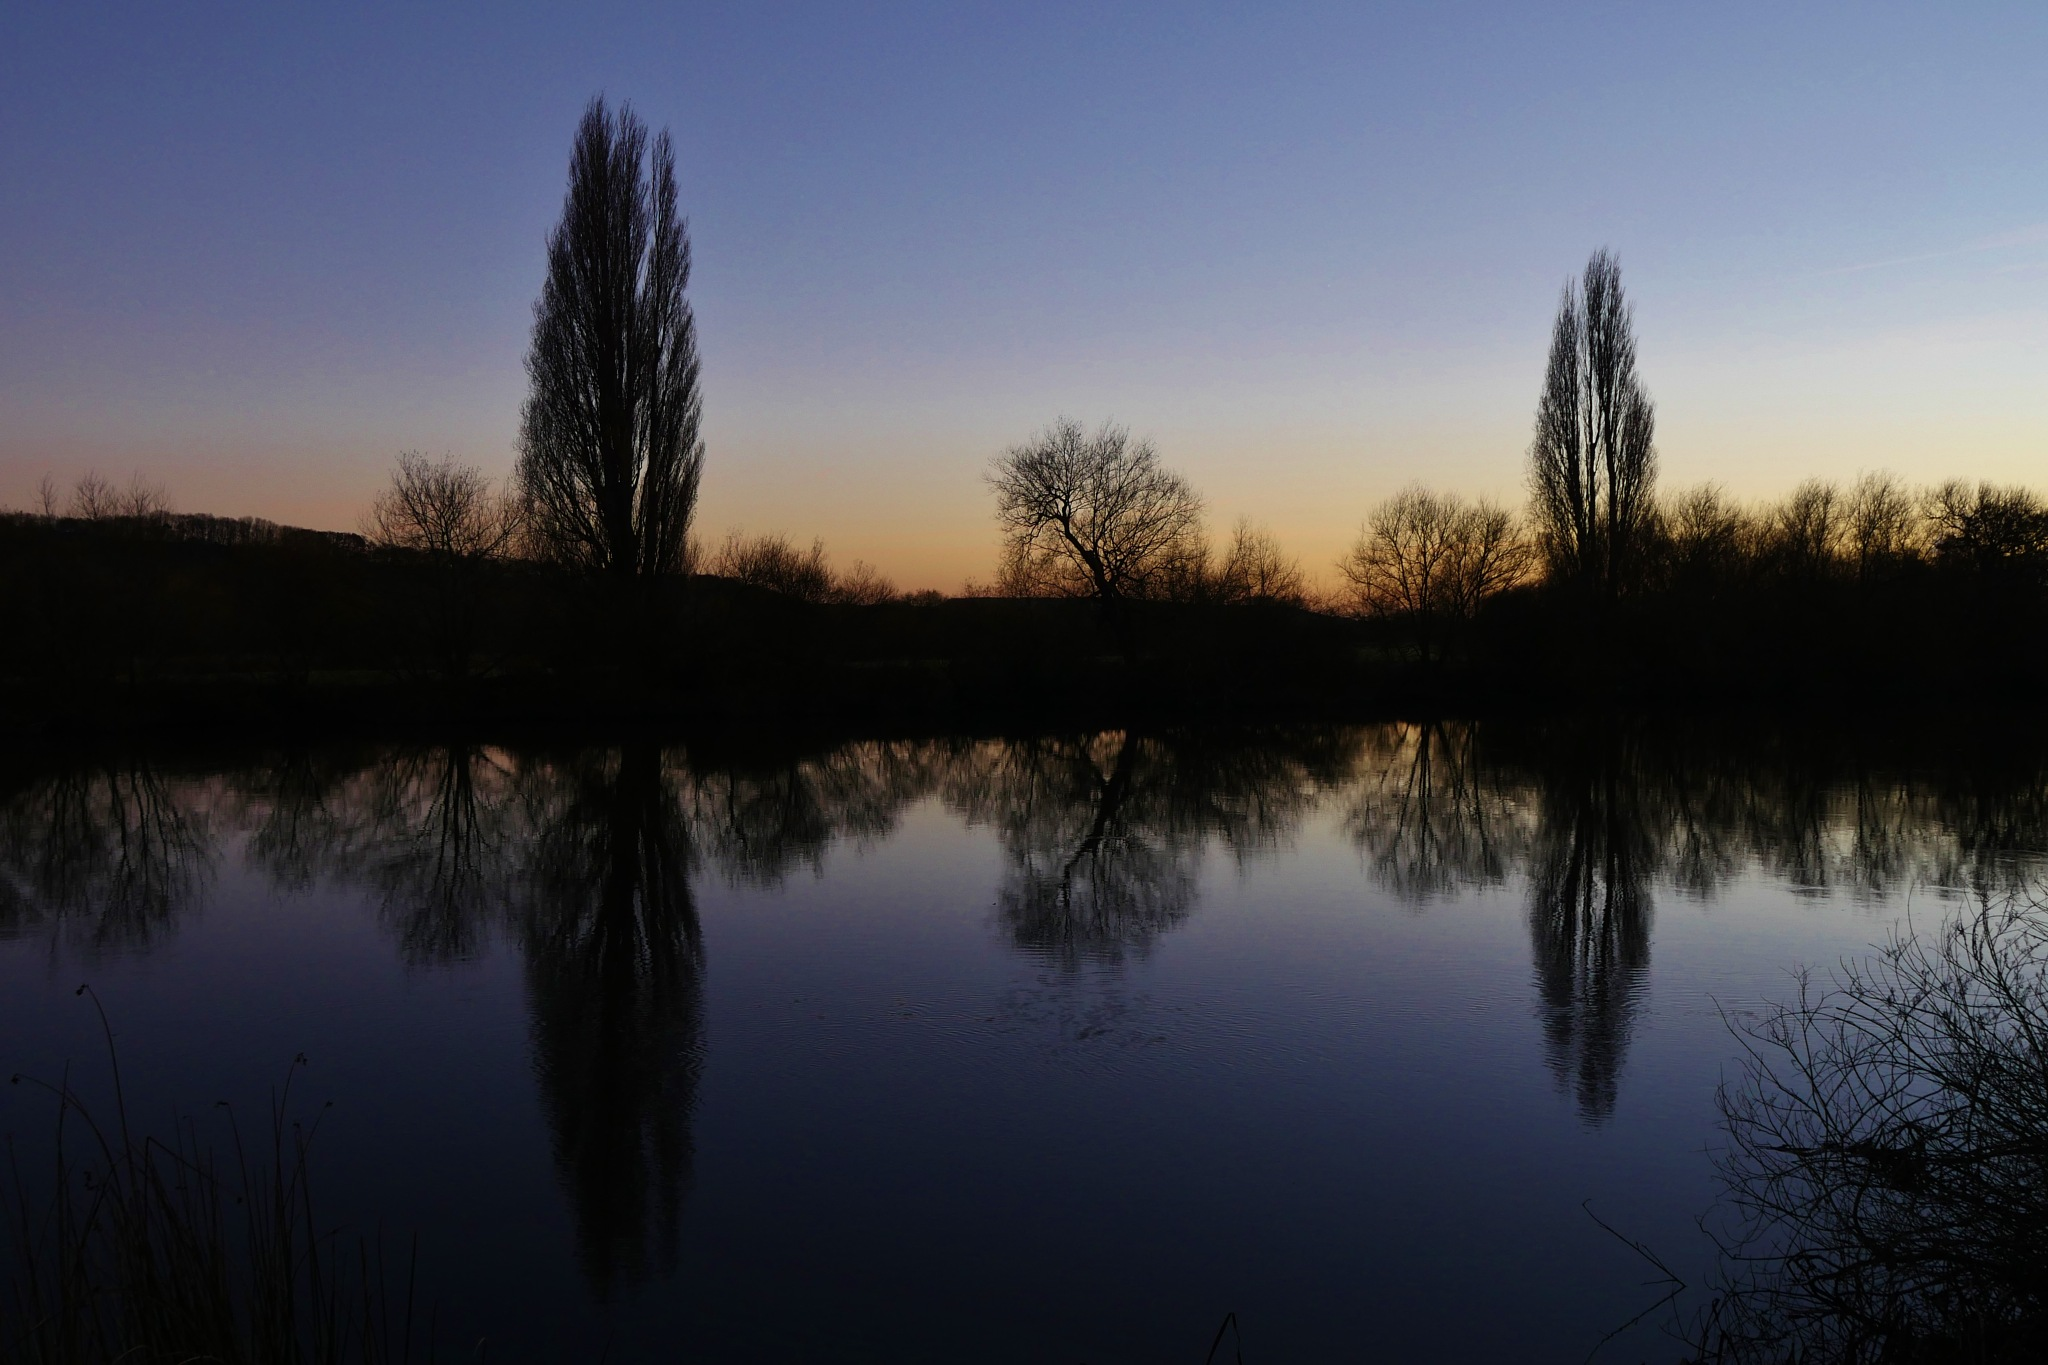 Winter river trees by AJ Yakstrangler Andy Jamieson